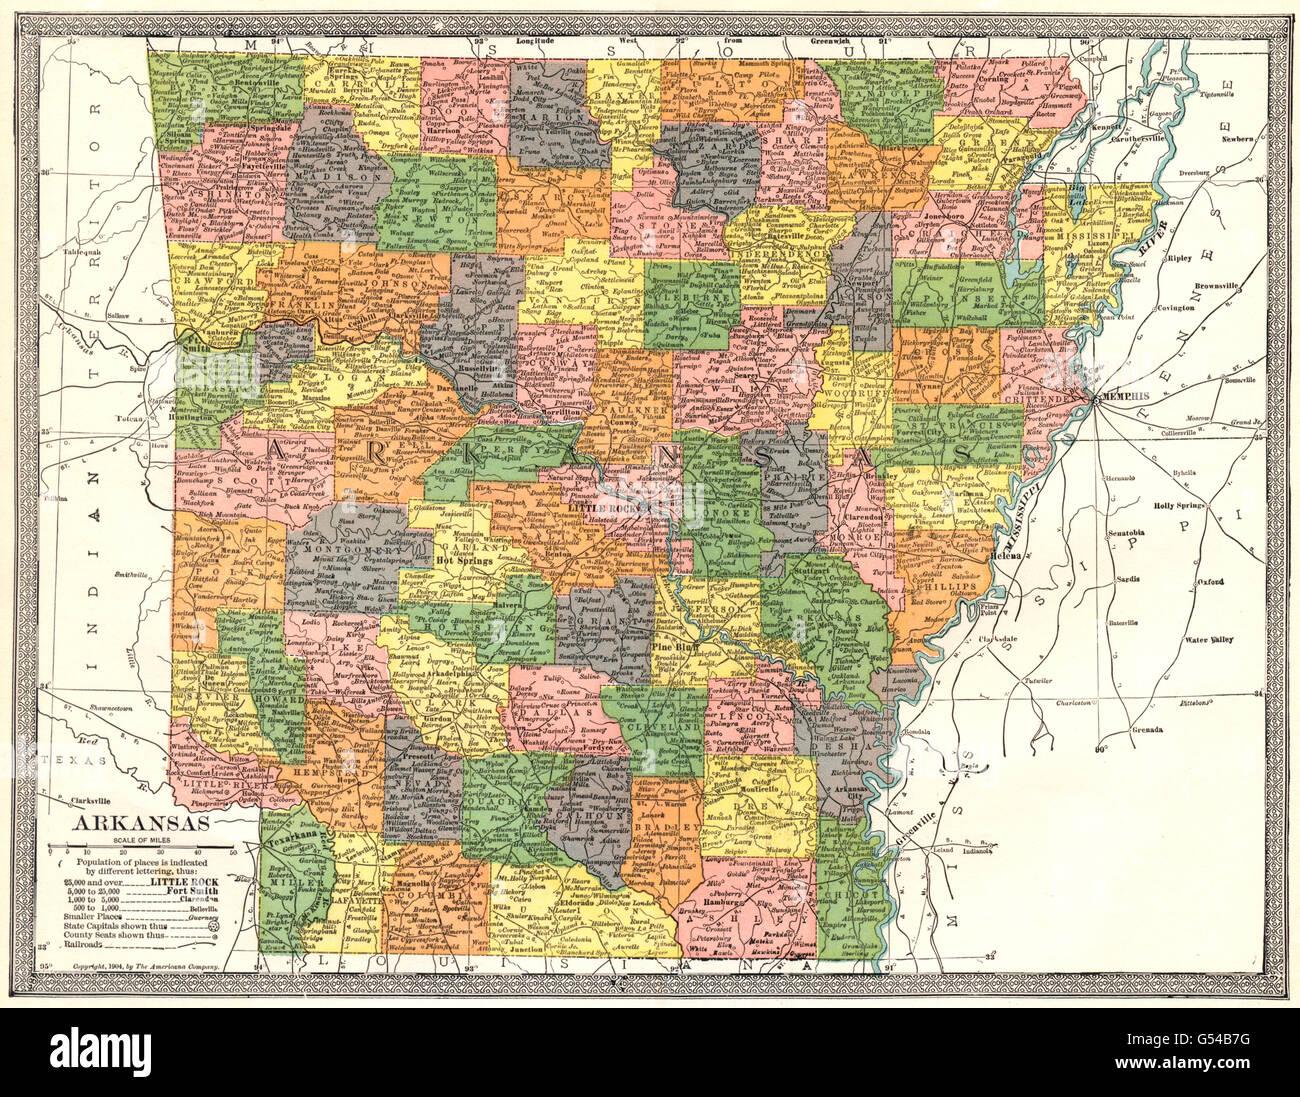 ARKANSAS state map. Counties, 1907 Stock Photo: 106432132 ...